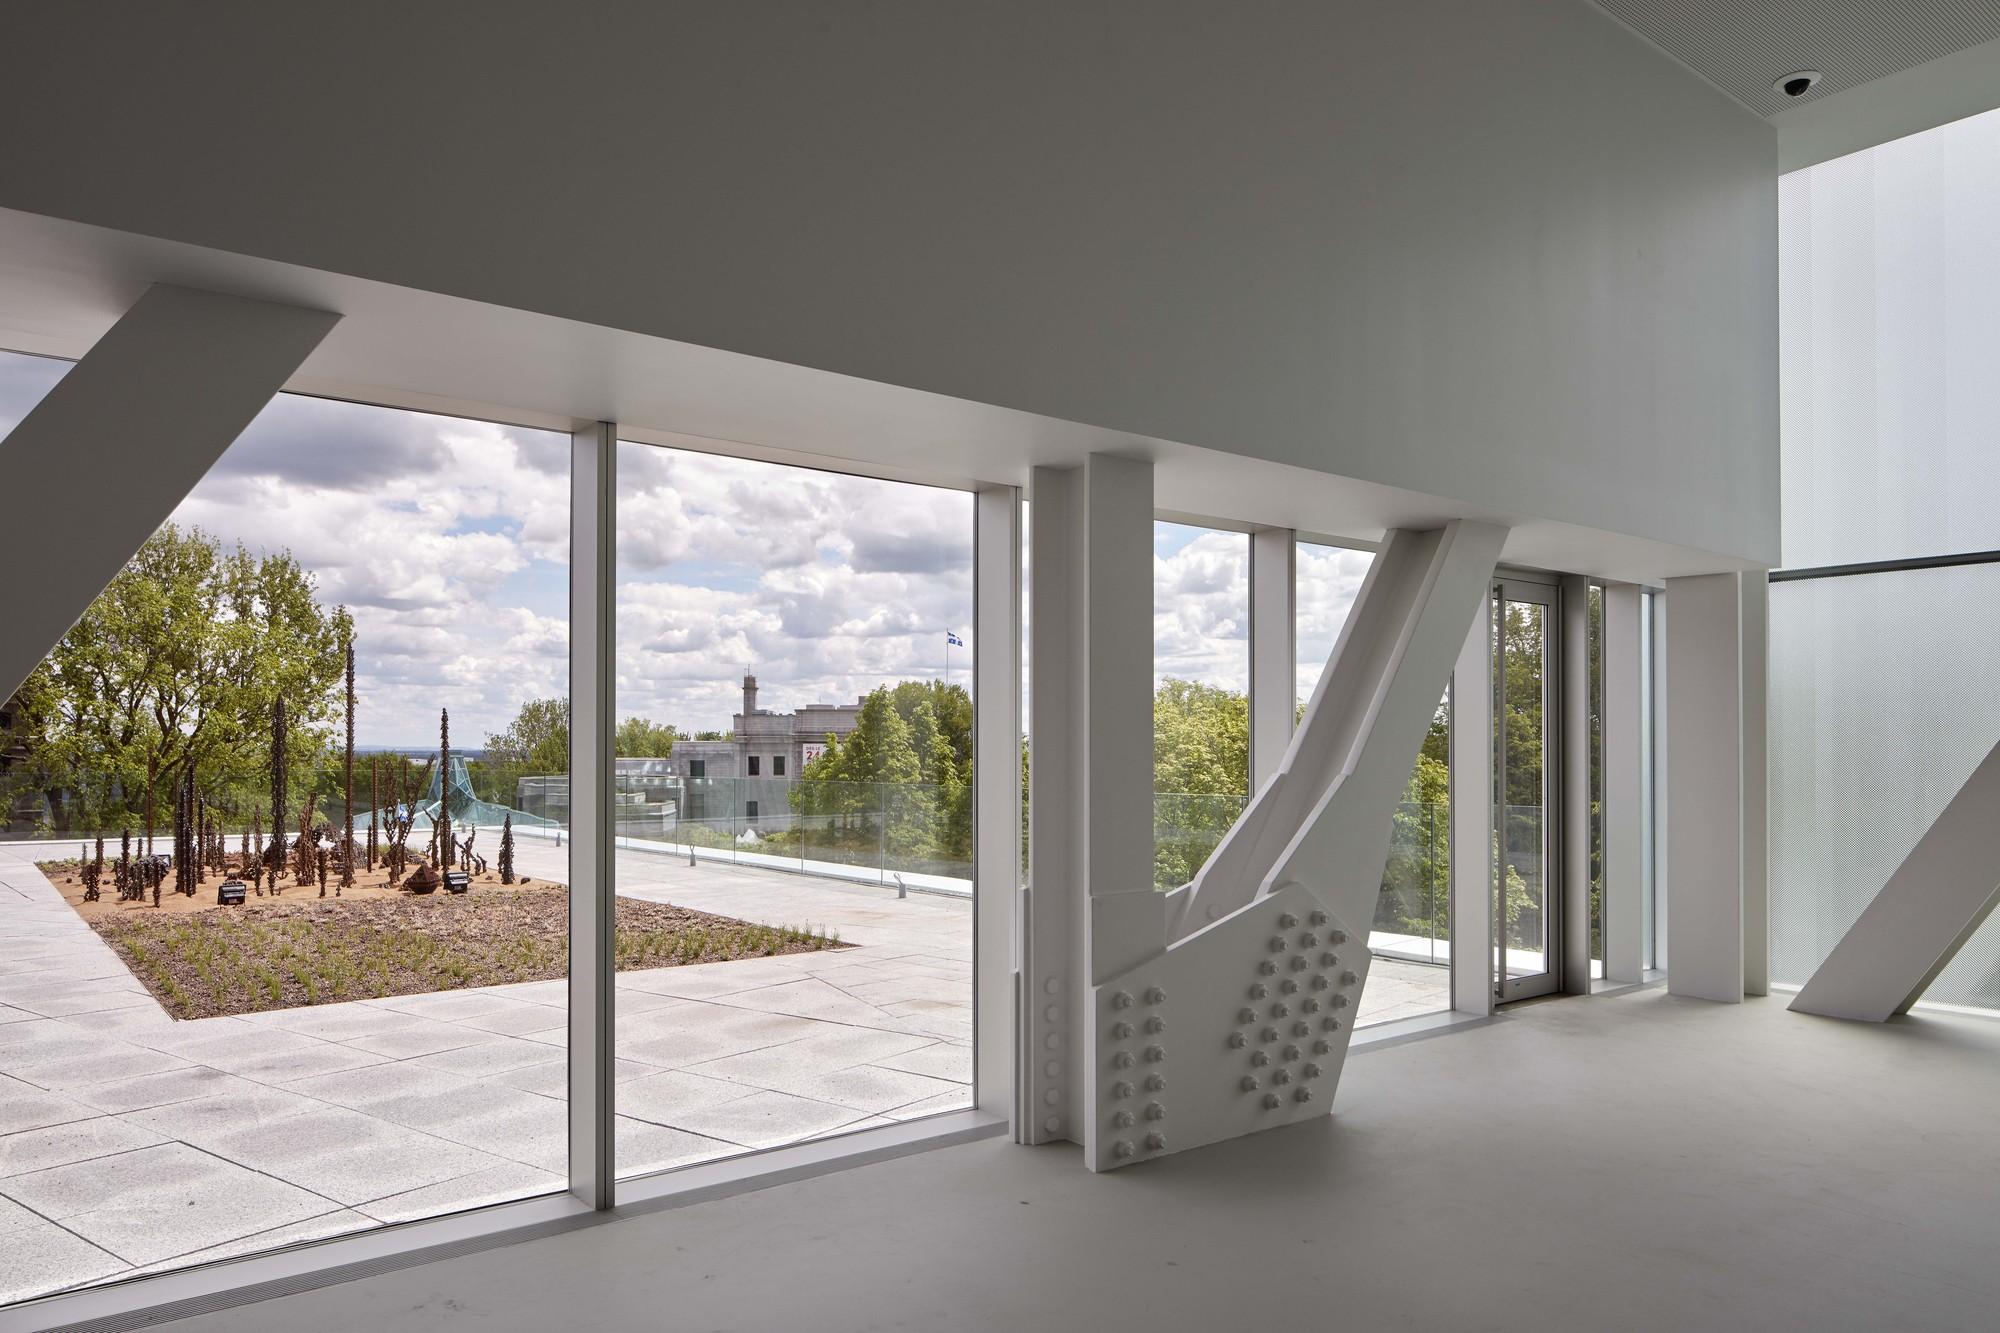 Gallery of pierre lassonde pavilion at the mus e national for Galerie du meuble quebec